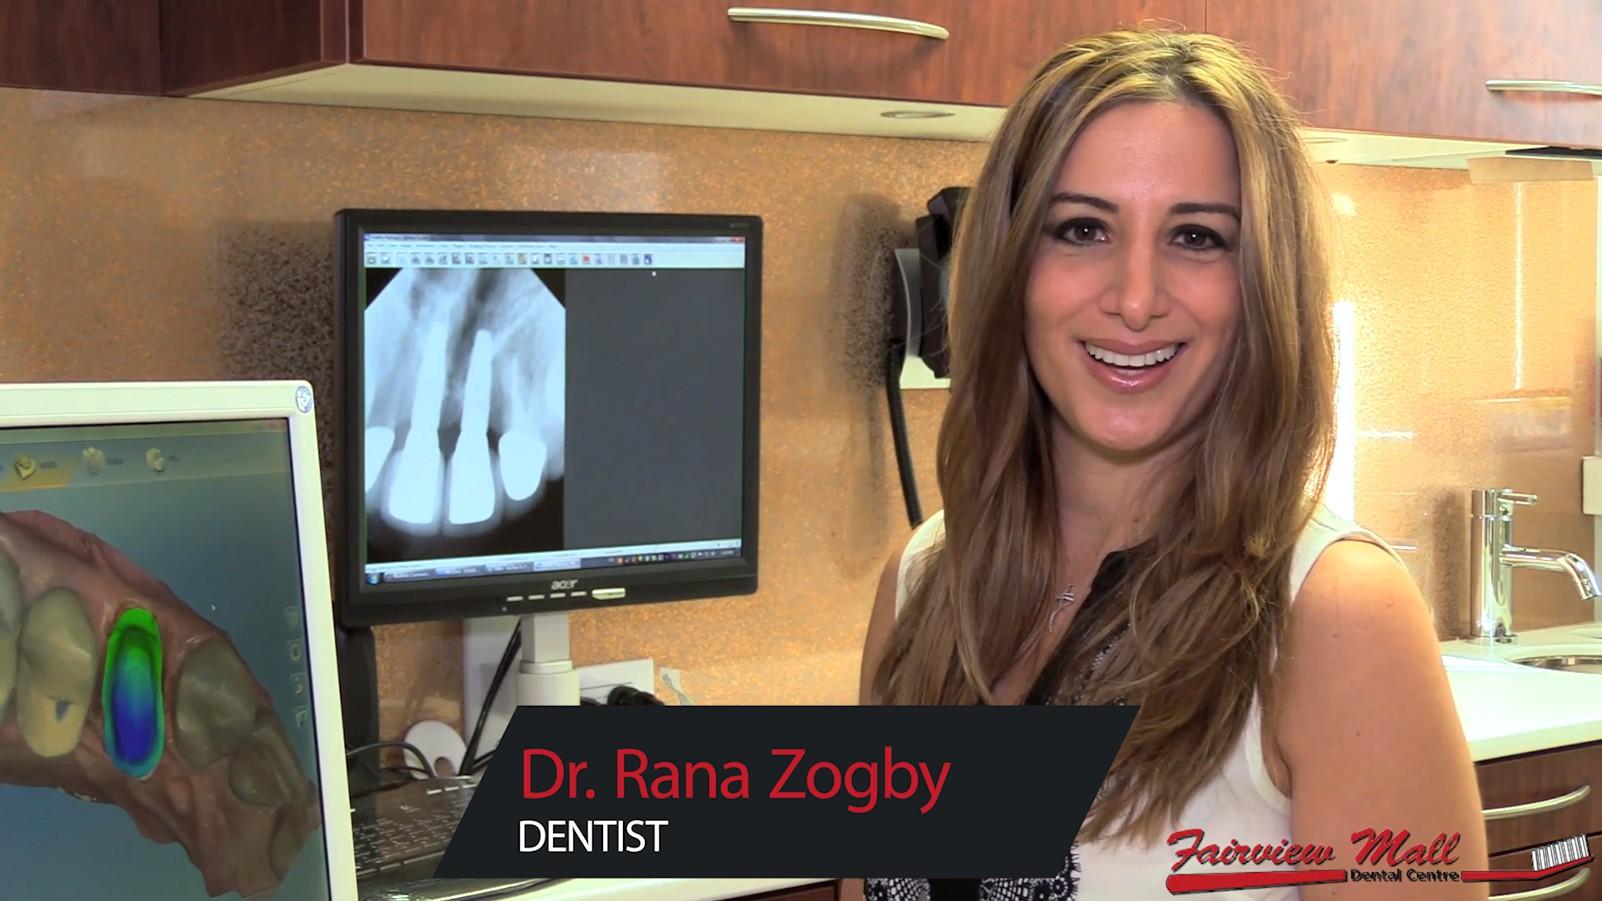 Fairview Mall Dental Centre - Dentistes - 4164911100